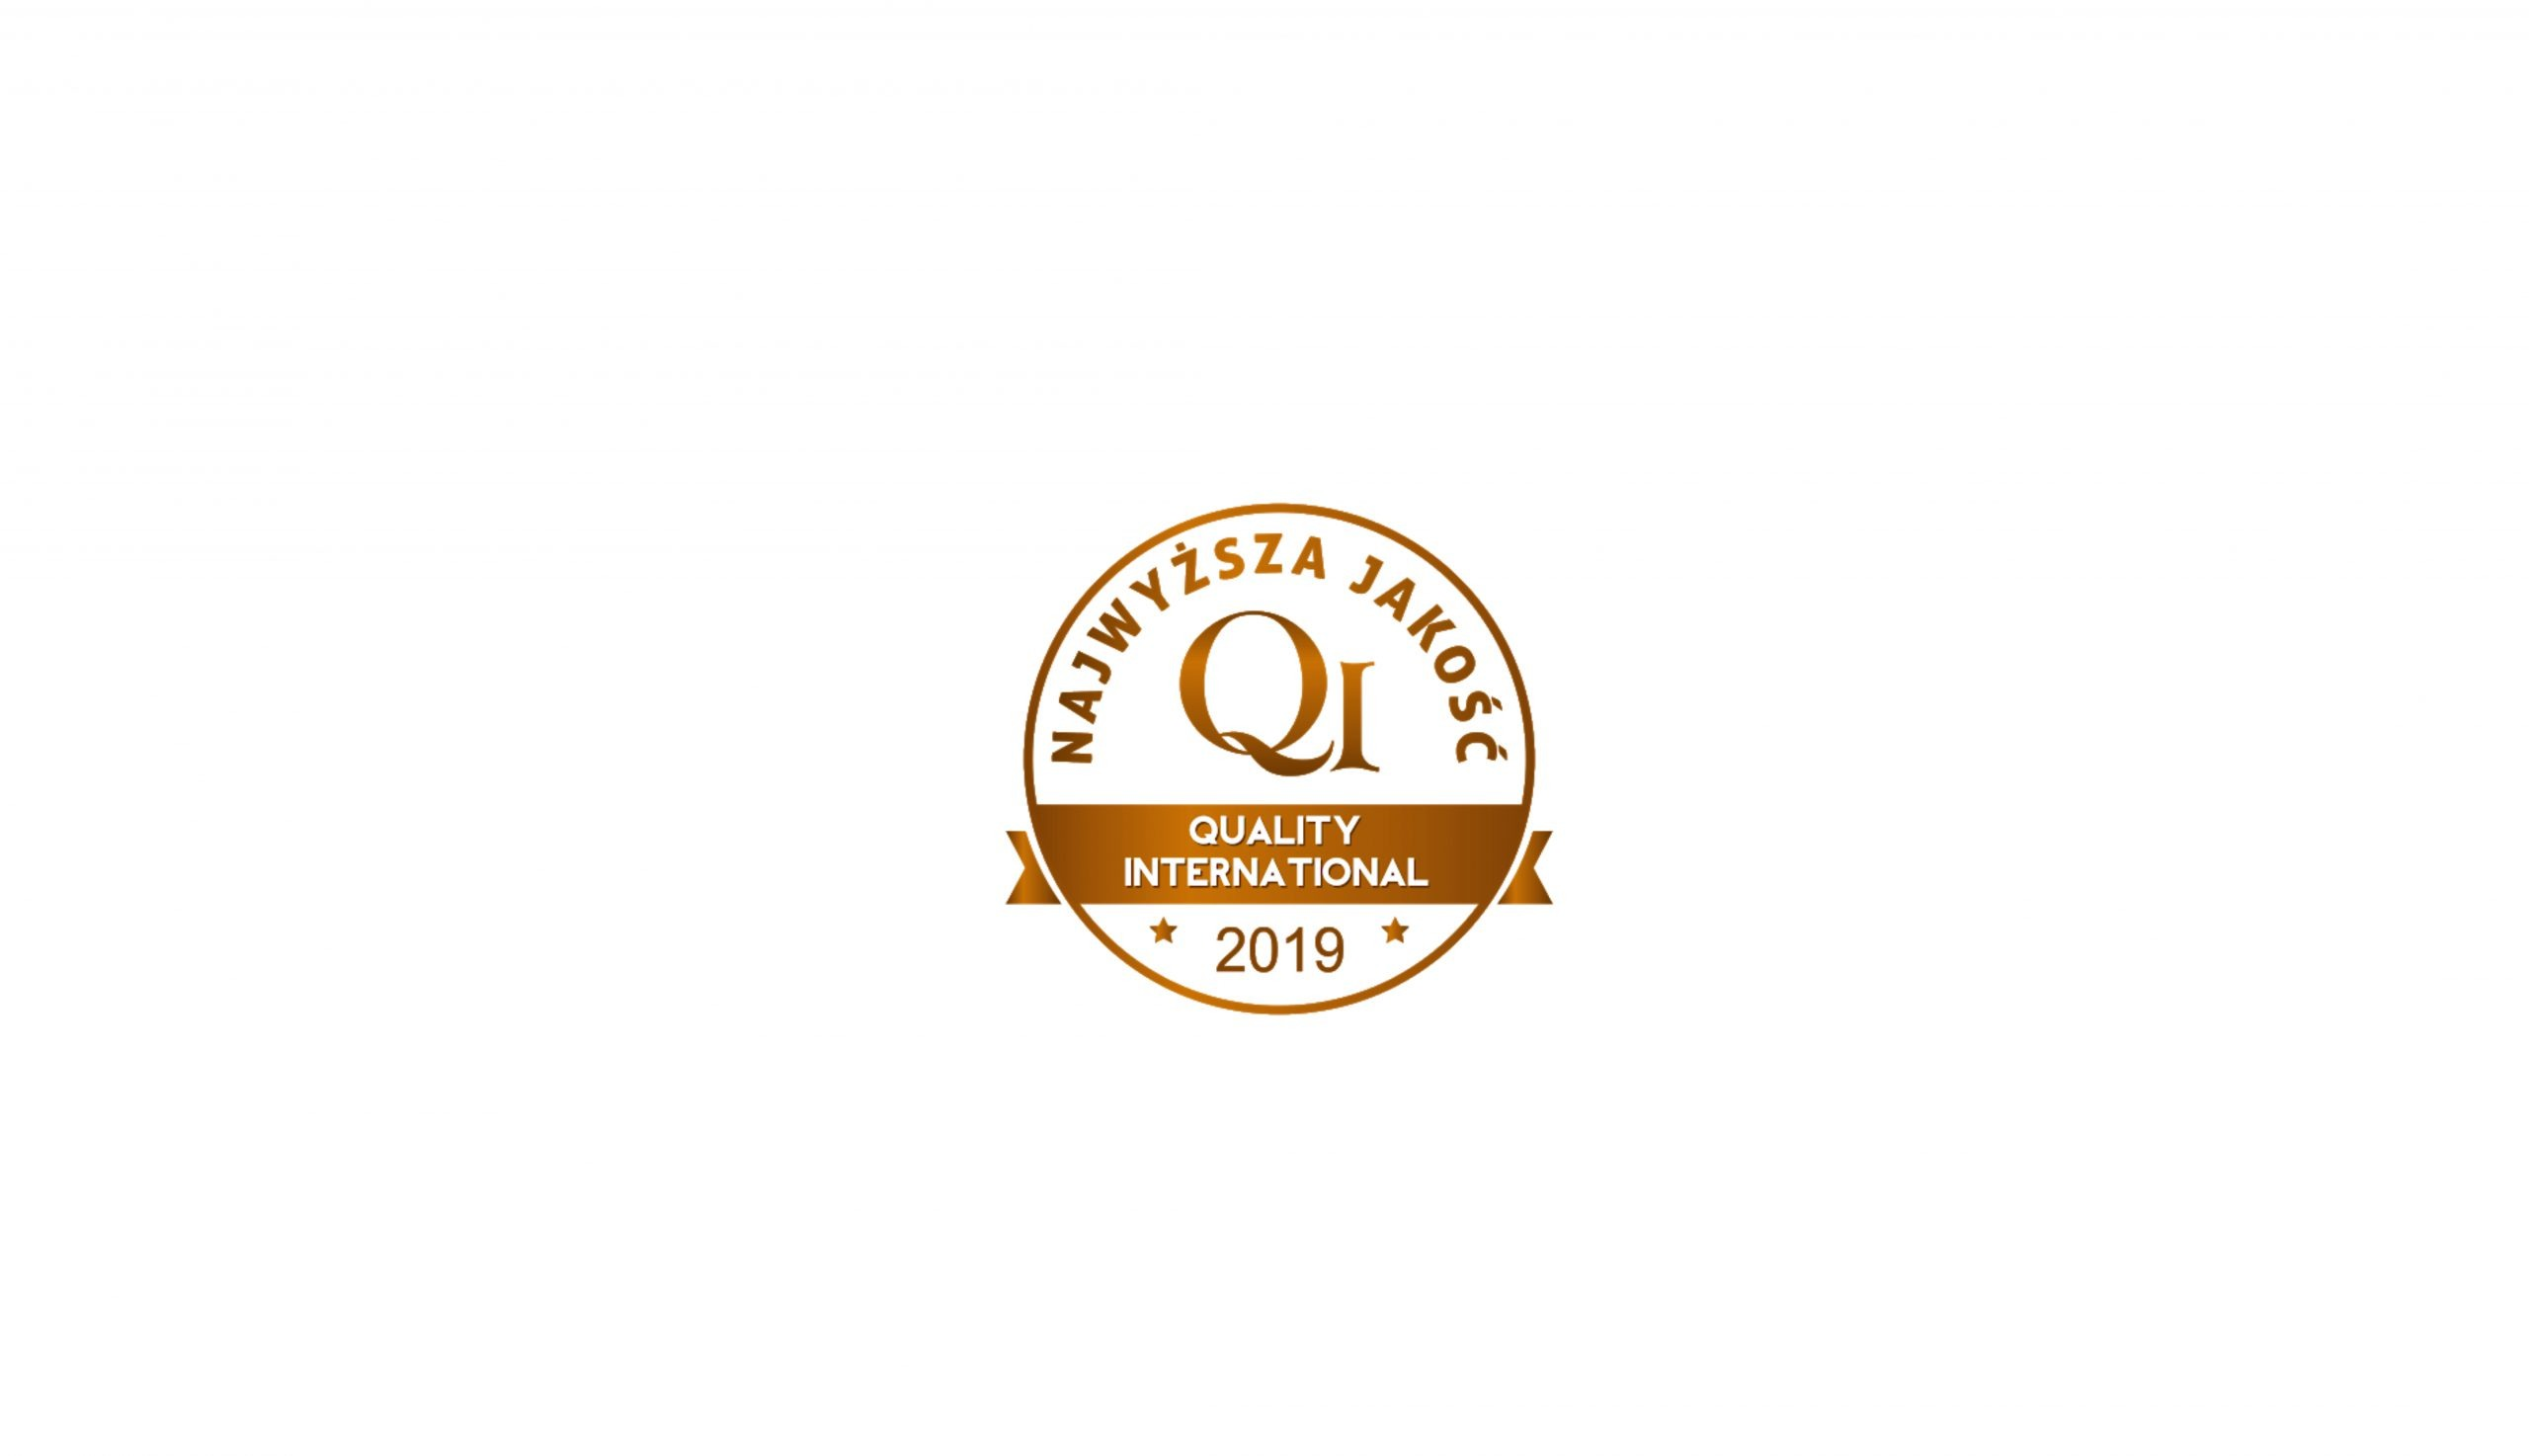 Nominacja – 07.2019 r.